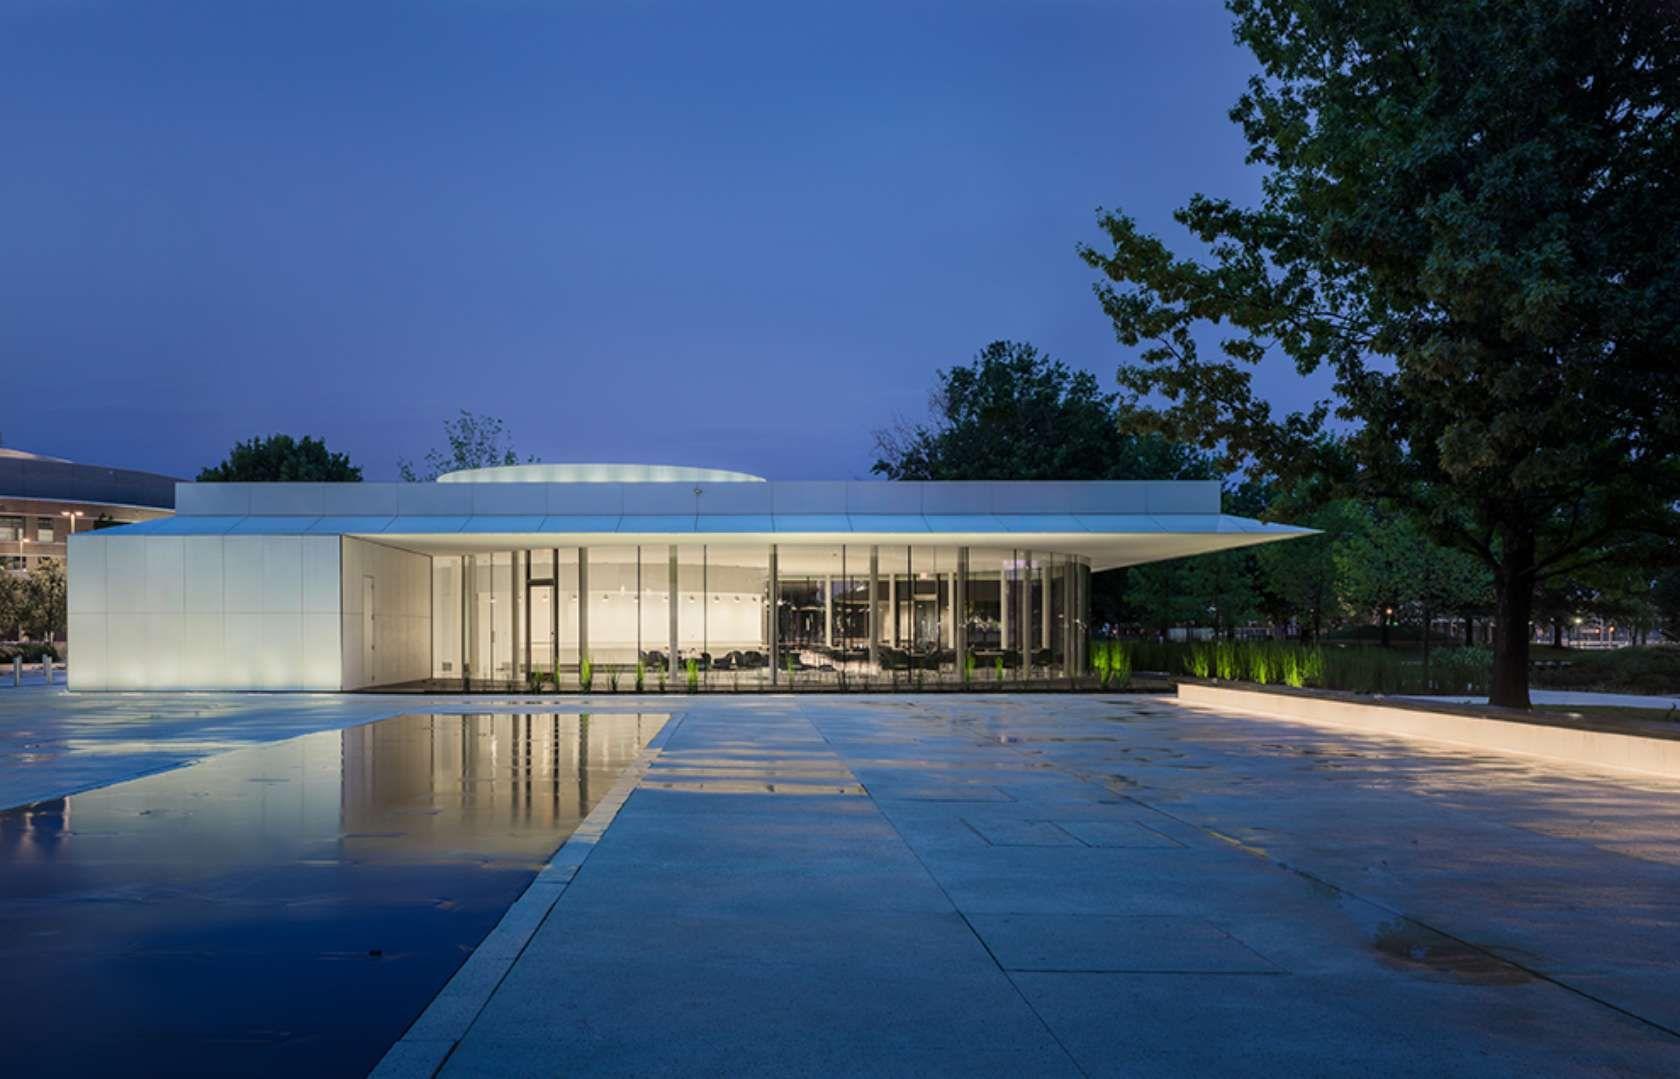 The design team, transformed Oklahoma City's Myriad